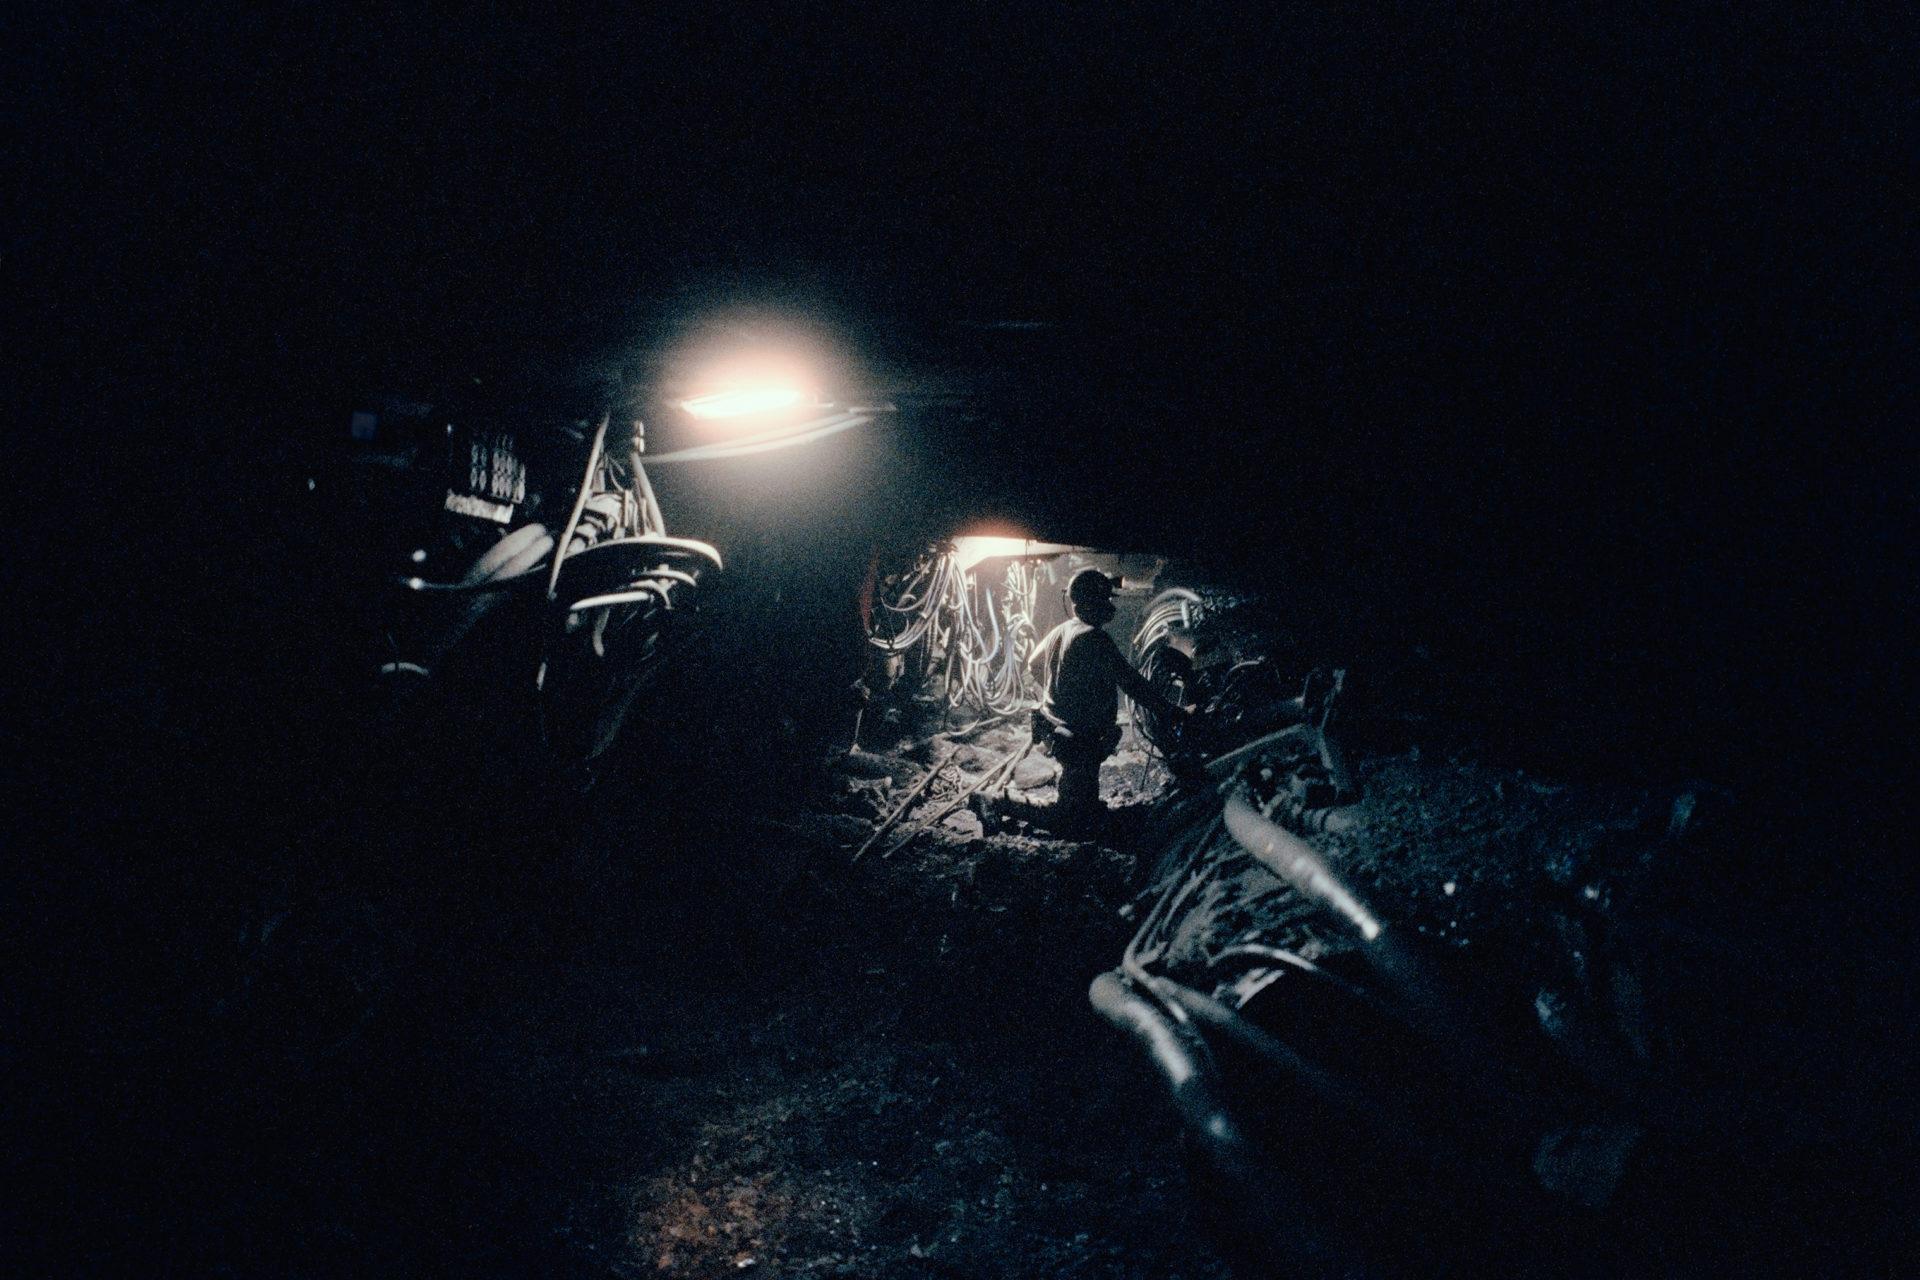 nanna-heitmann-germany-coal-mine-10-new